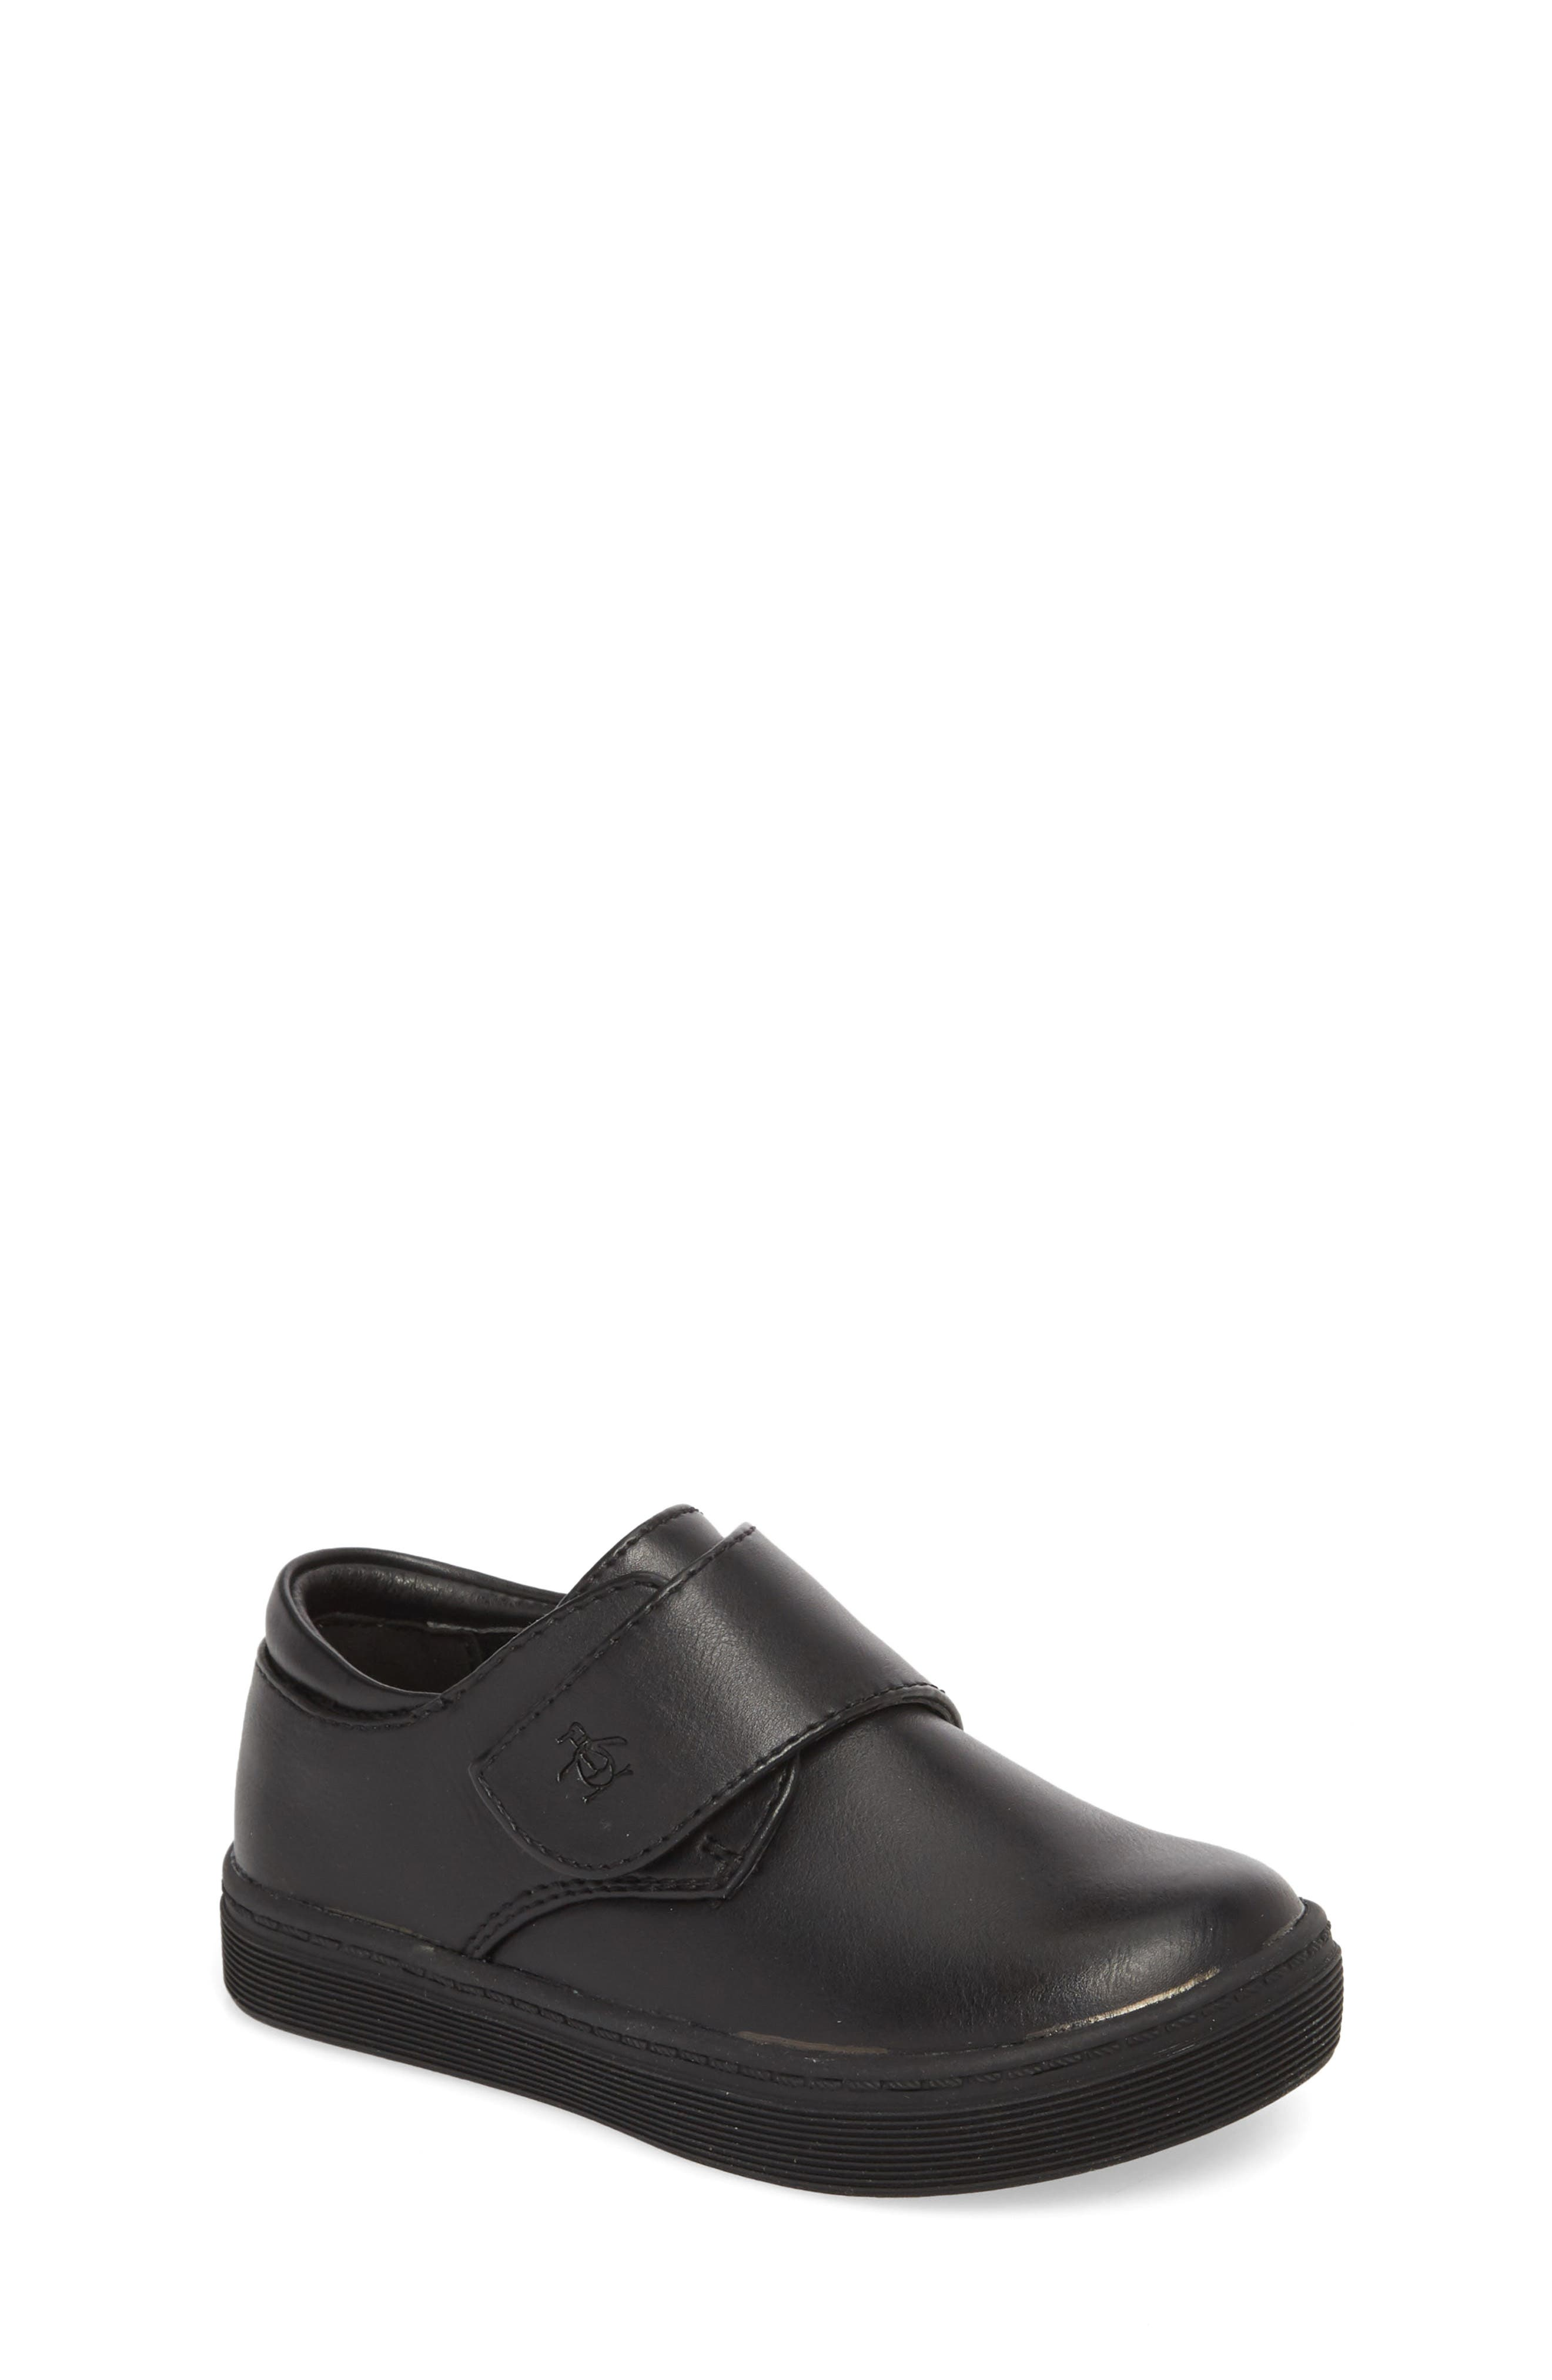 ORIGINAL PENGUIN, Felton Sneaker, Main thumbnail 1, color, BLACK/ BLACK